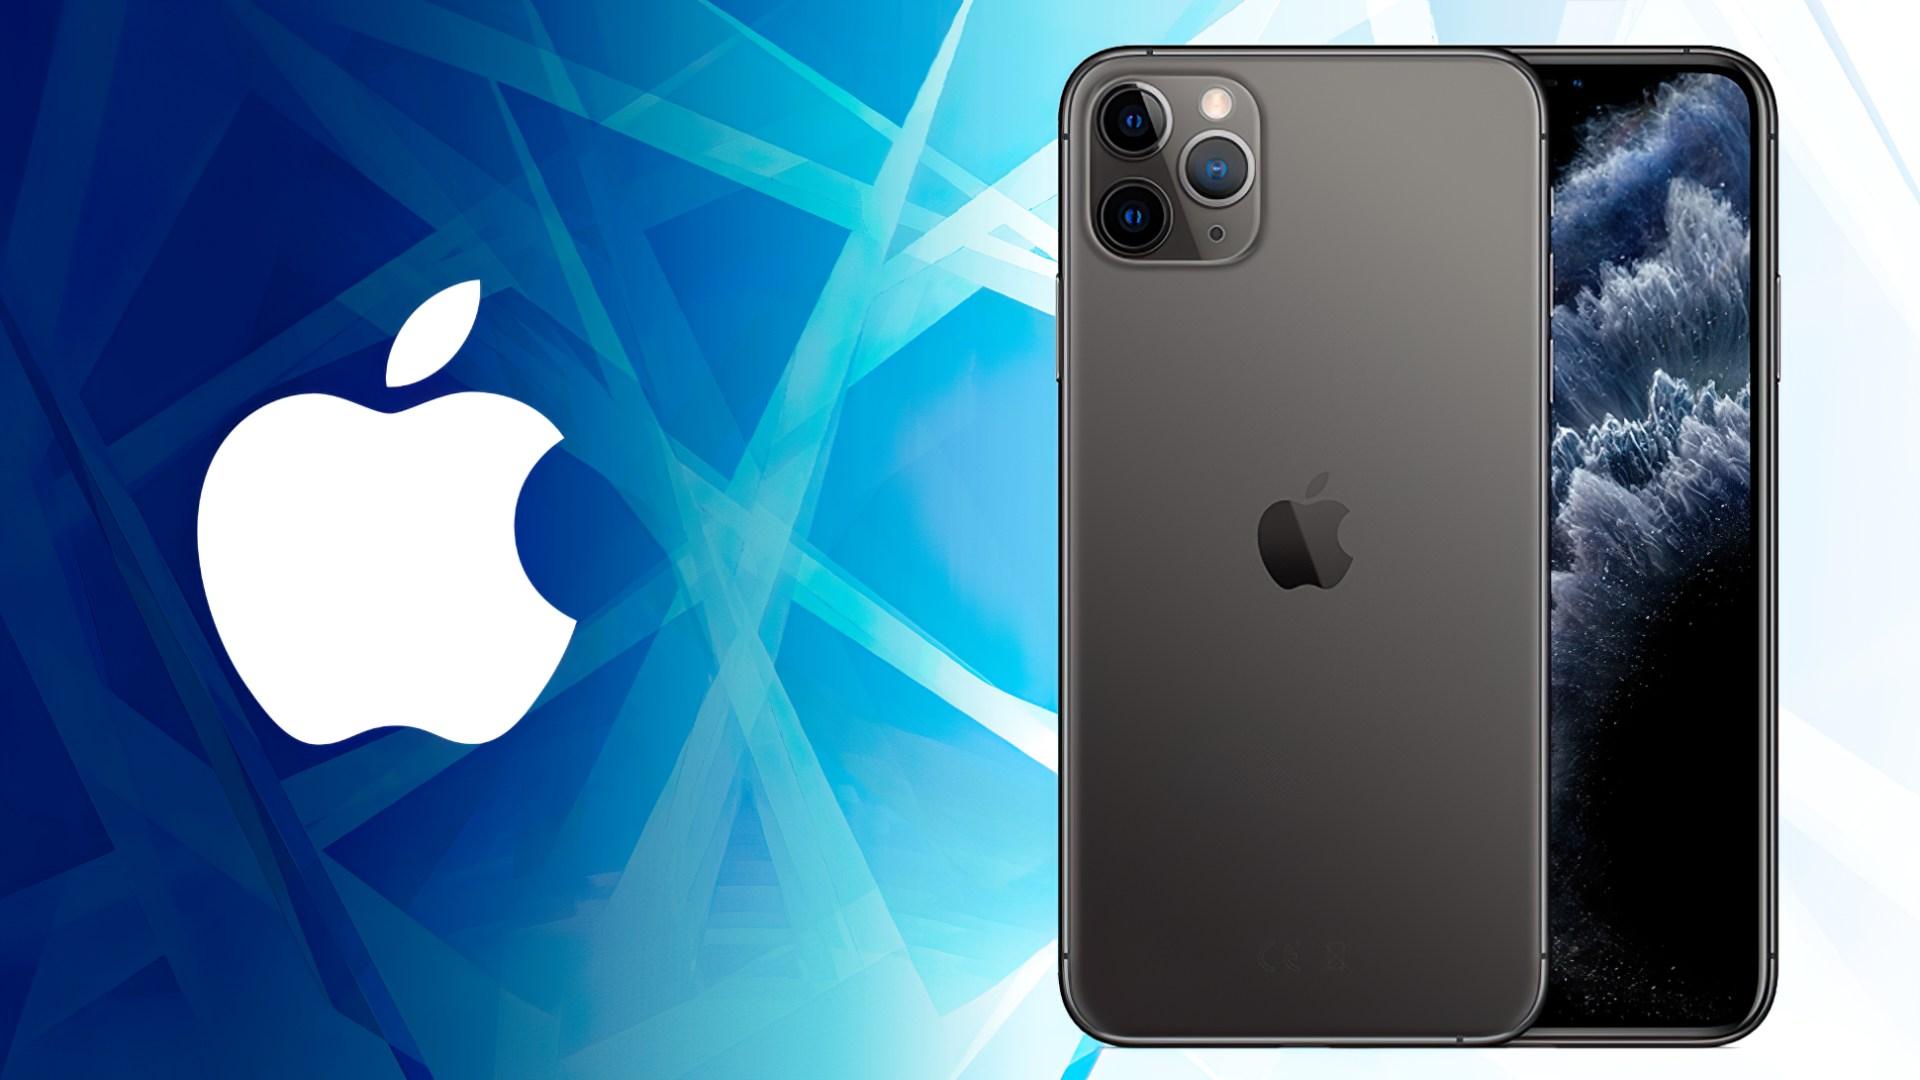 Smartphone, Apple, Iphone, Logo, Apple iPhone, iPhone X, iPhone 11, Apple Logo, iPhone 11 Pro, iPhone 11 Pro Max